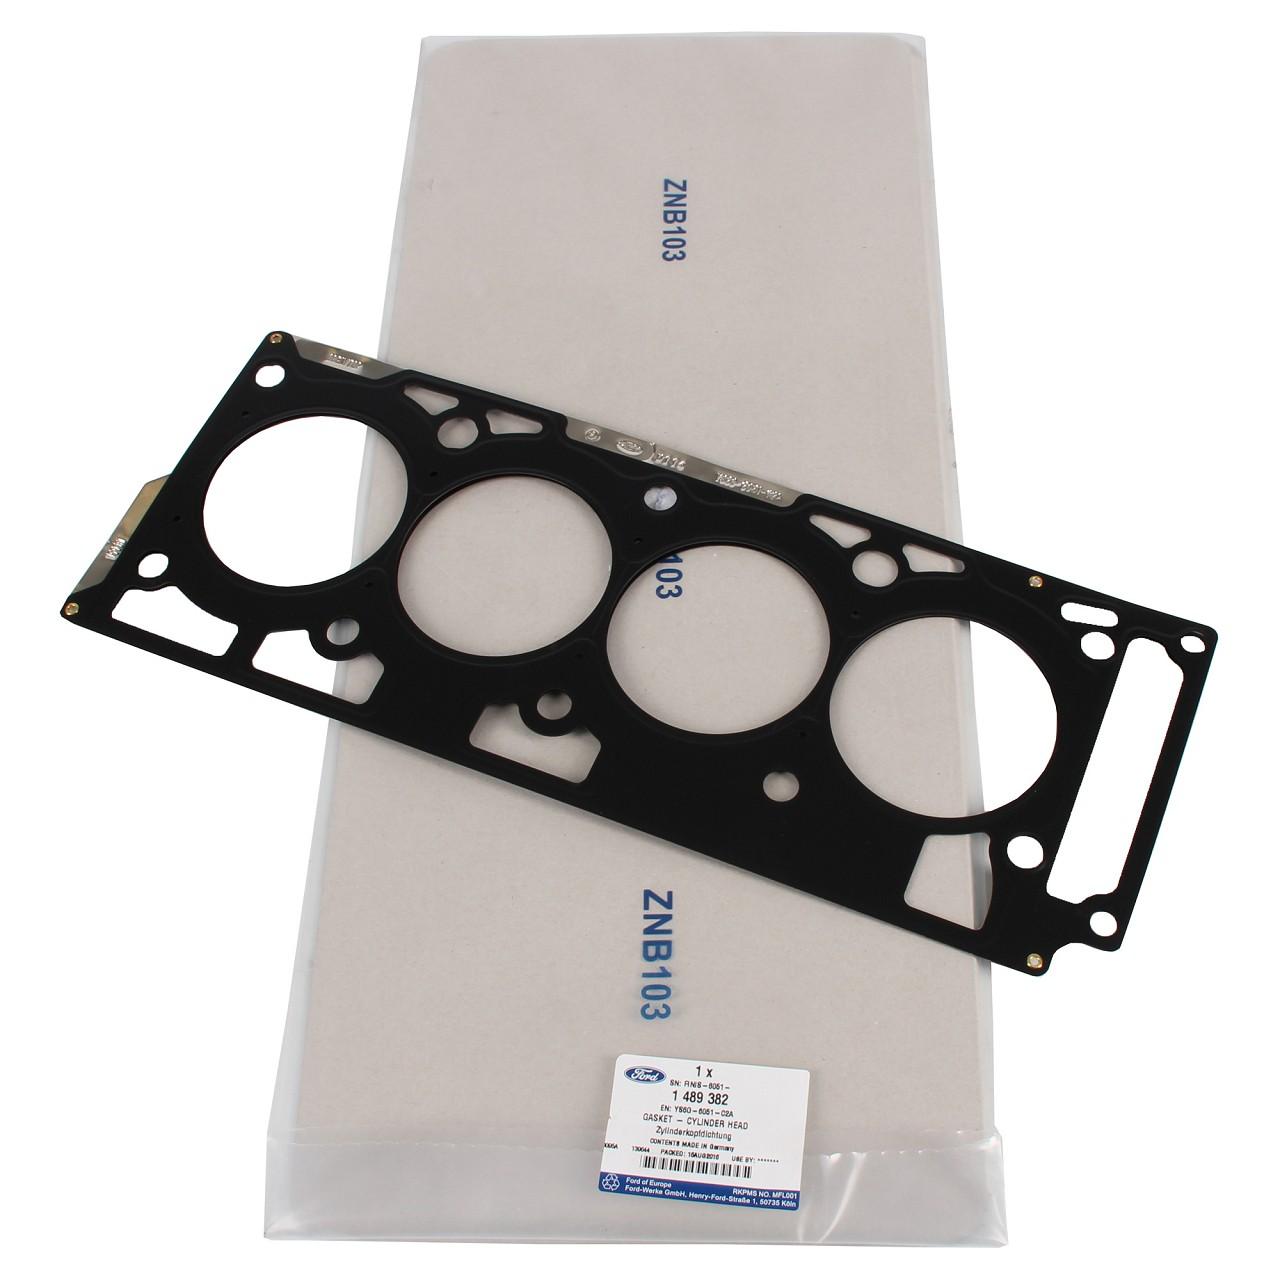 ORIGINAL Ford Zylinderkopfdichtung KA (RB) STREET KA (RL2) 1.6i 95 PS 1489382